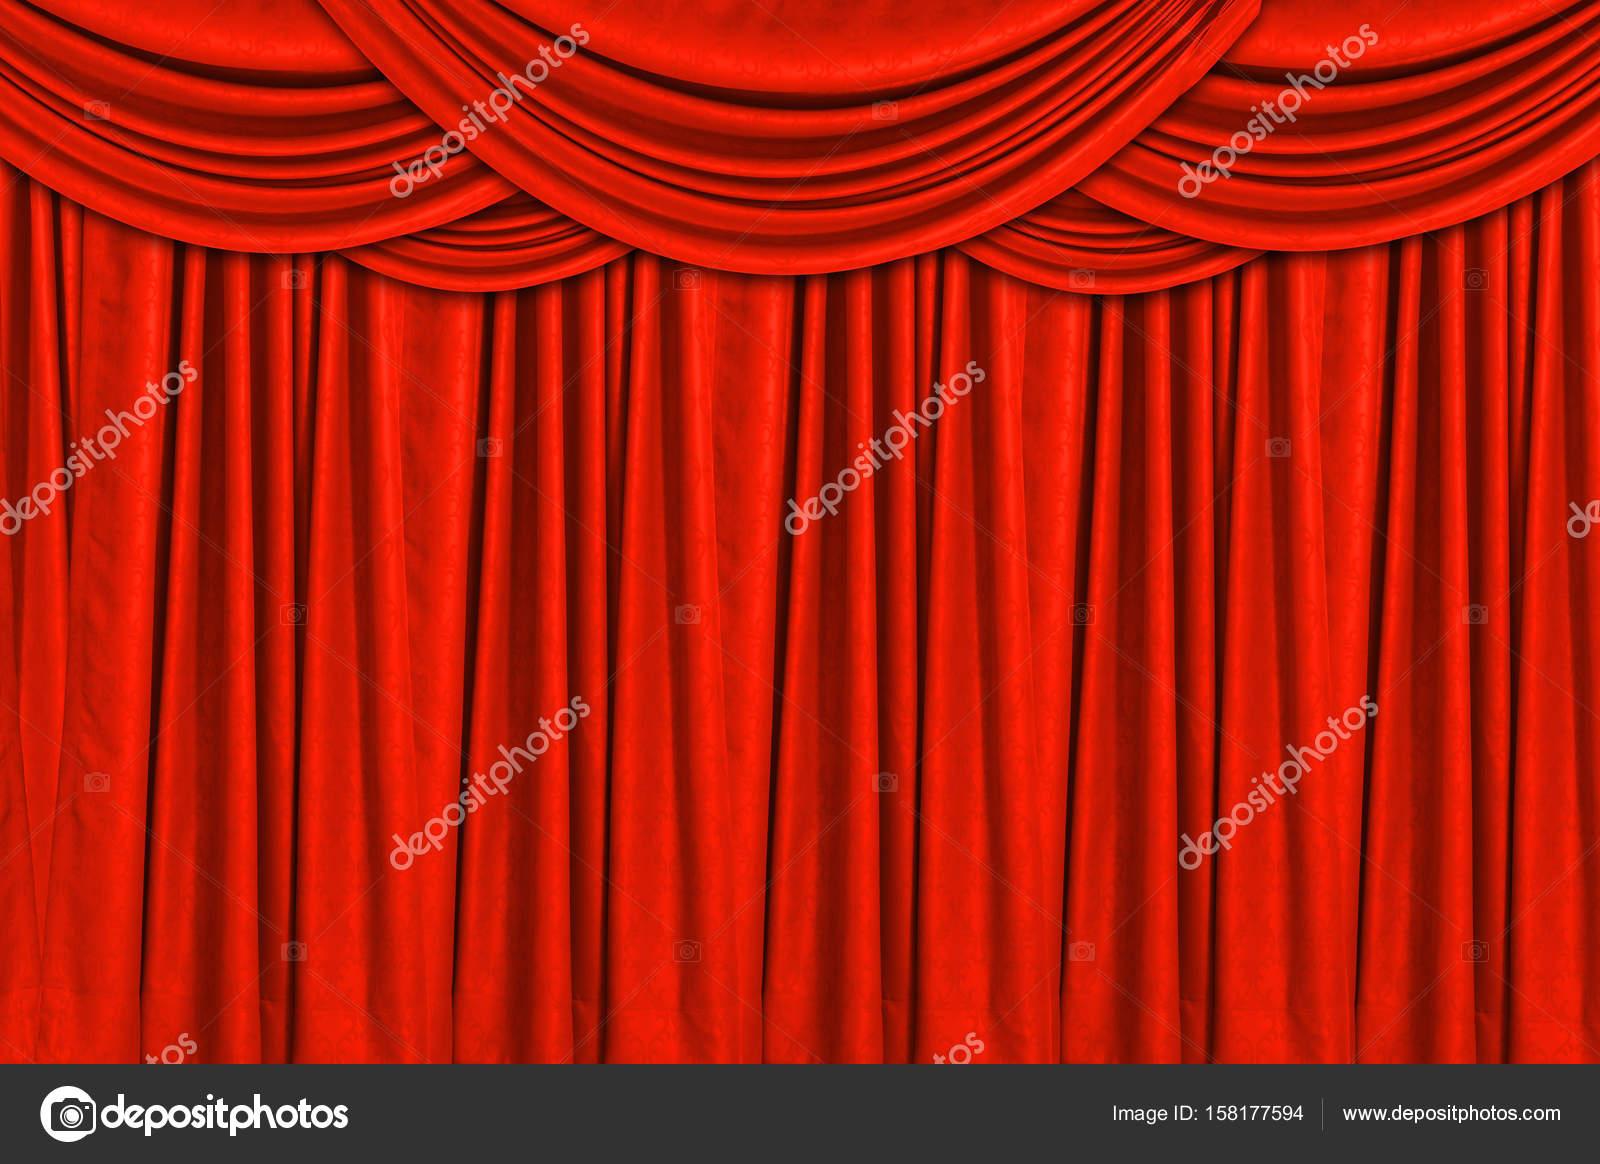 Rode gordijnen en podium vloer — Stockfoto © nirutdps #158177594